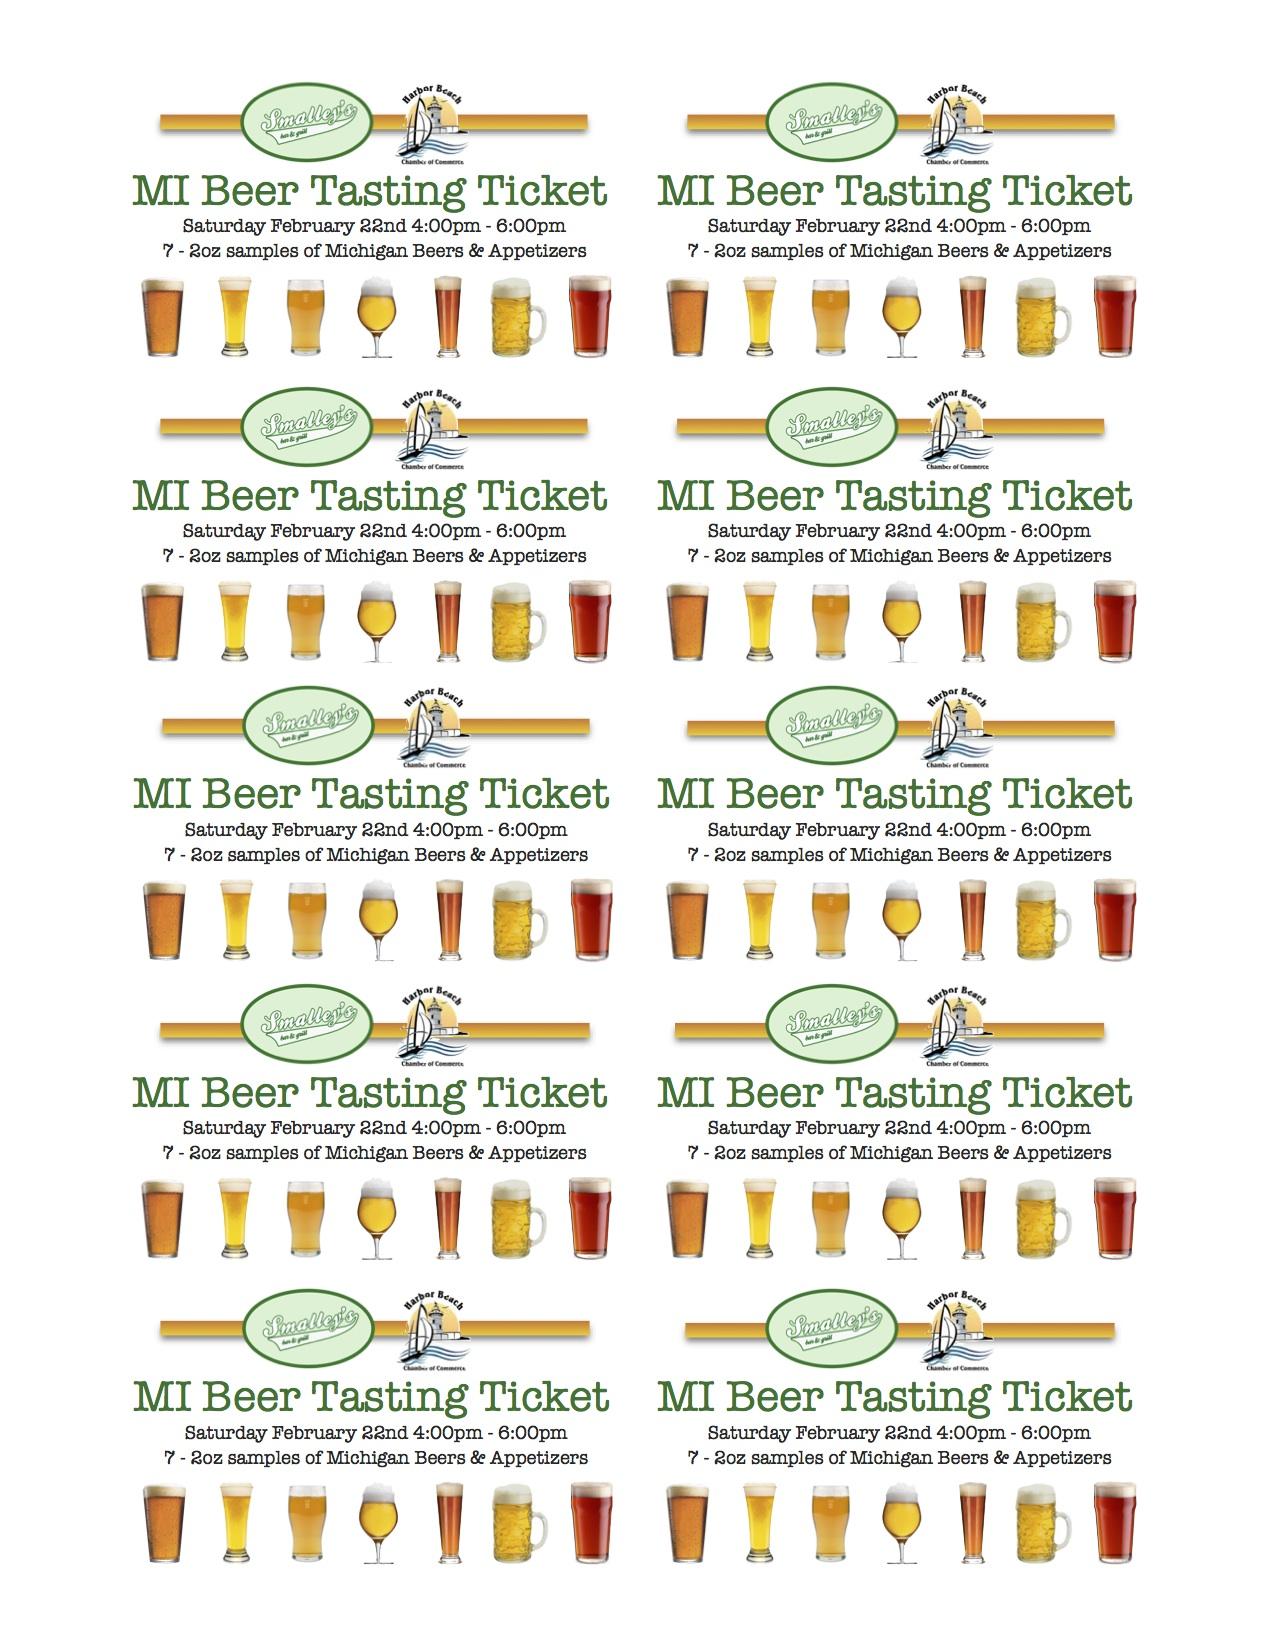 Smalleys Beer Tasting Tickets 2014.jpg